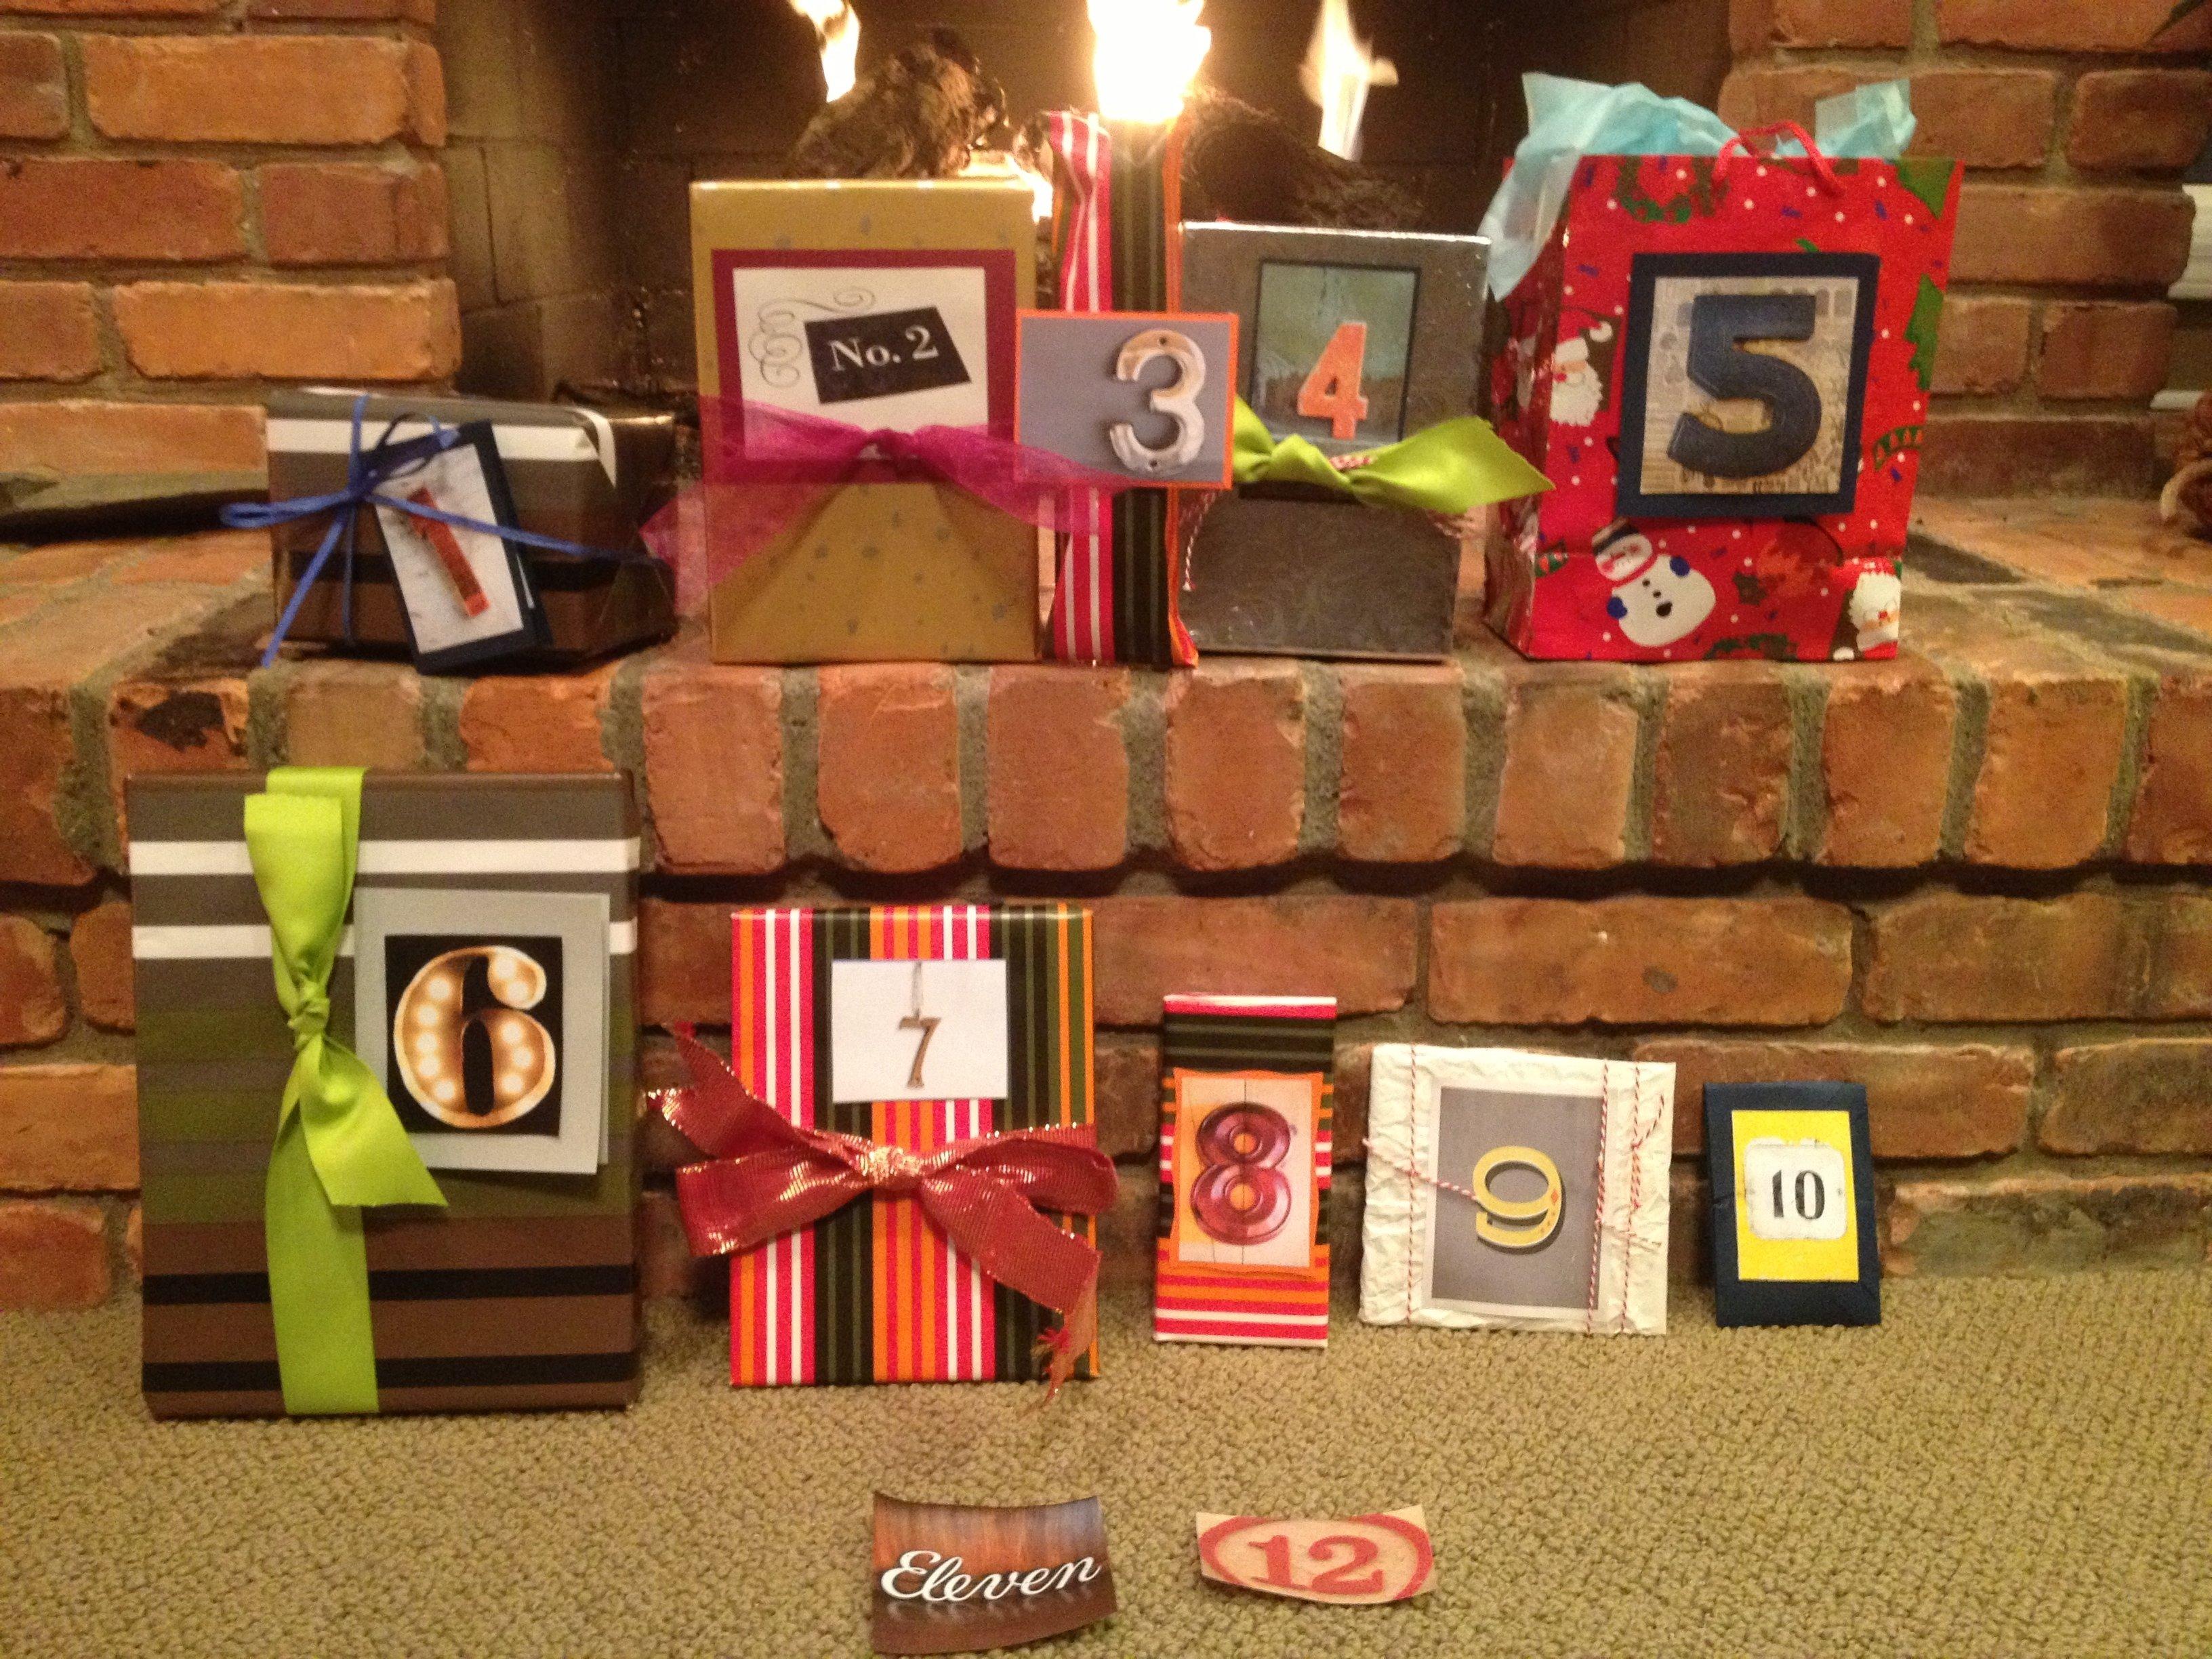 10 Stylish 12 Days Of Christmas Ideas For Boyfriend 12 days of christmas for my boyfriend he gets to open a small gift 4